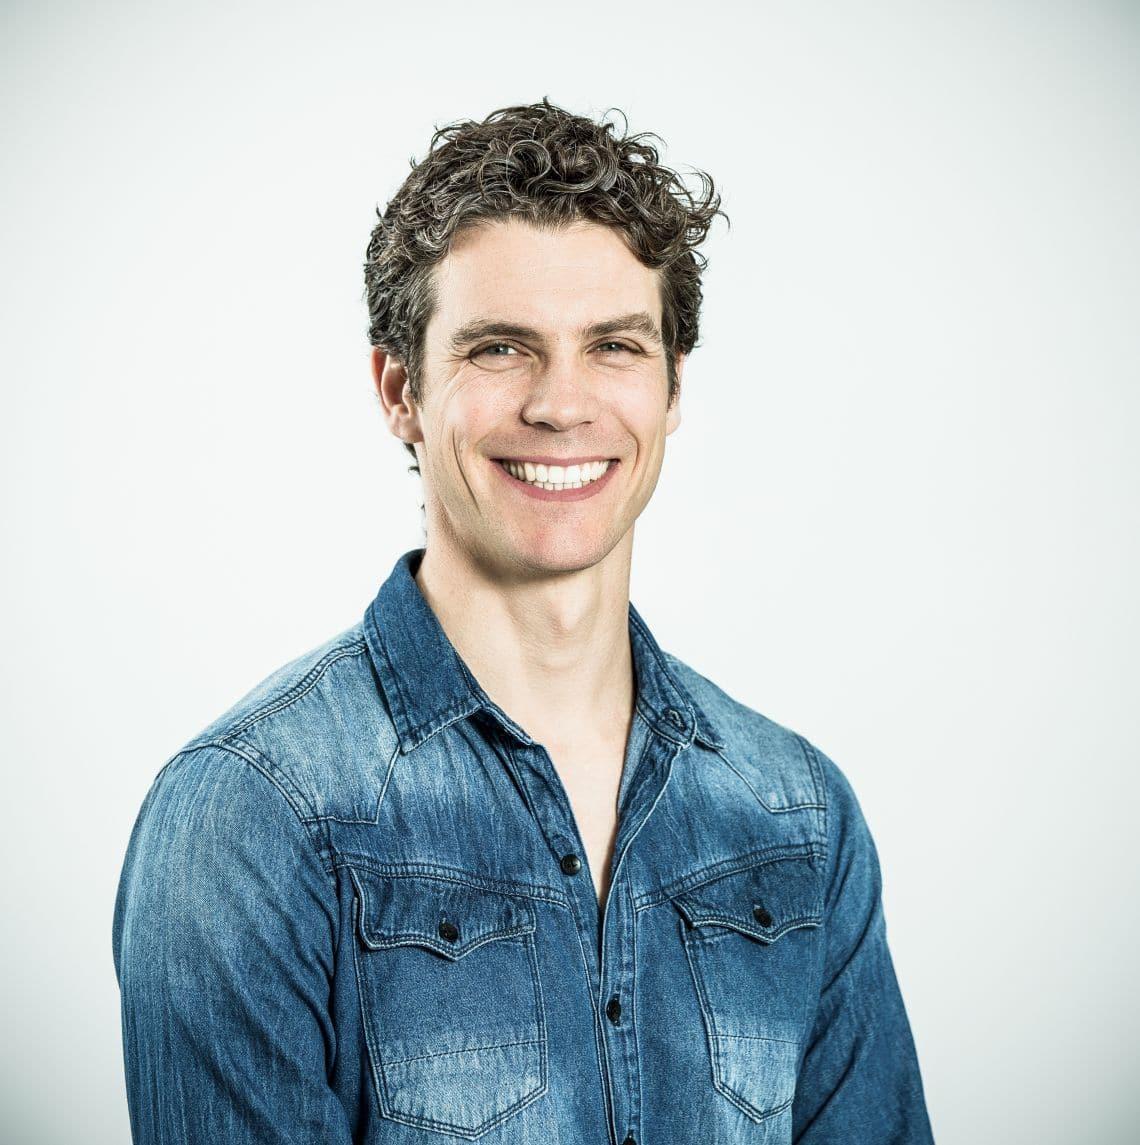 Alexander nagel (c) Marc Mueller